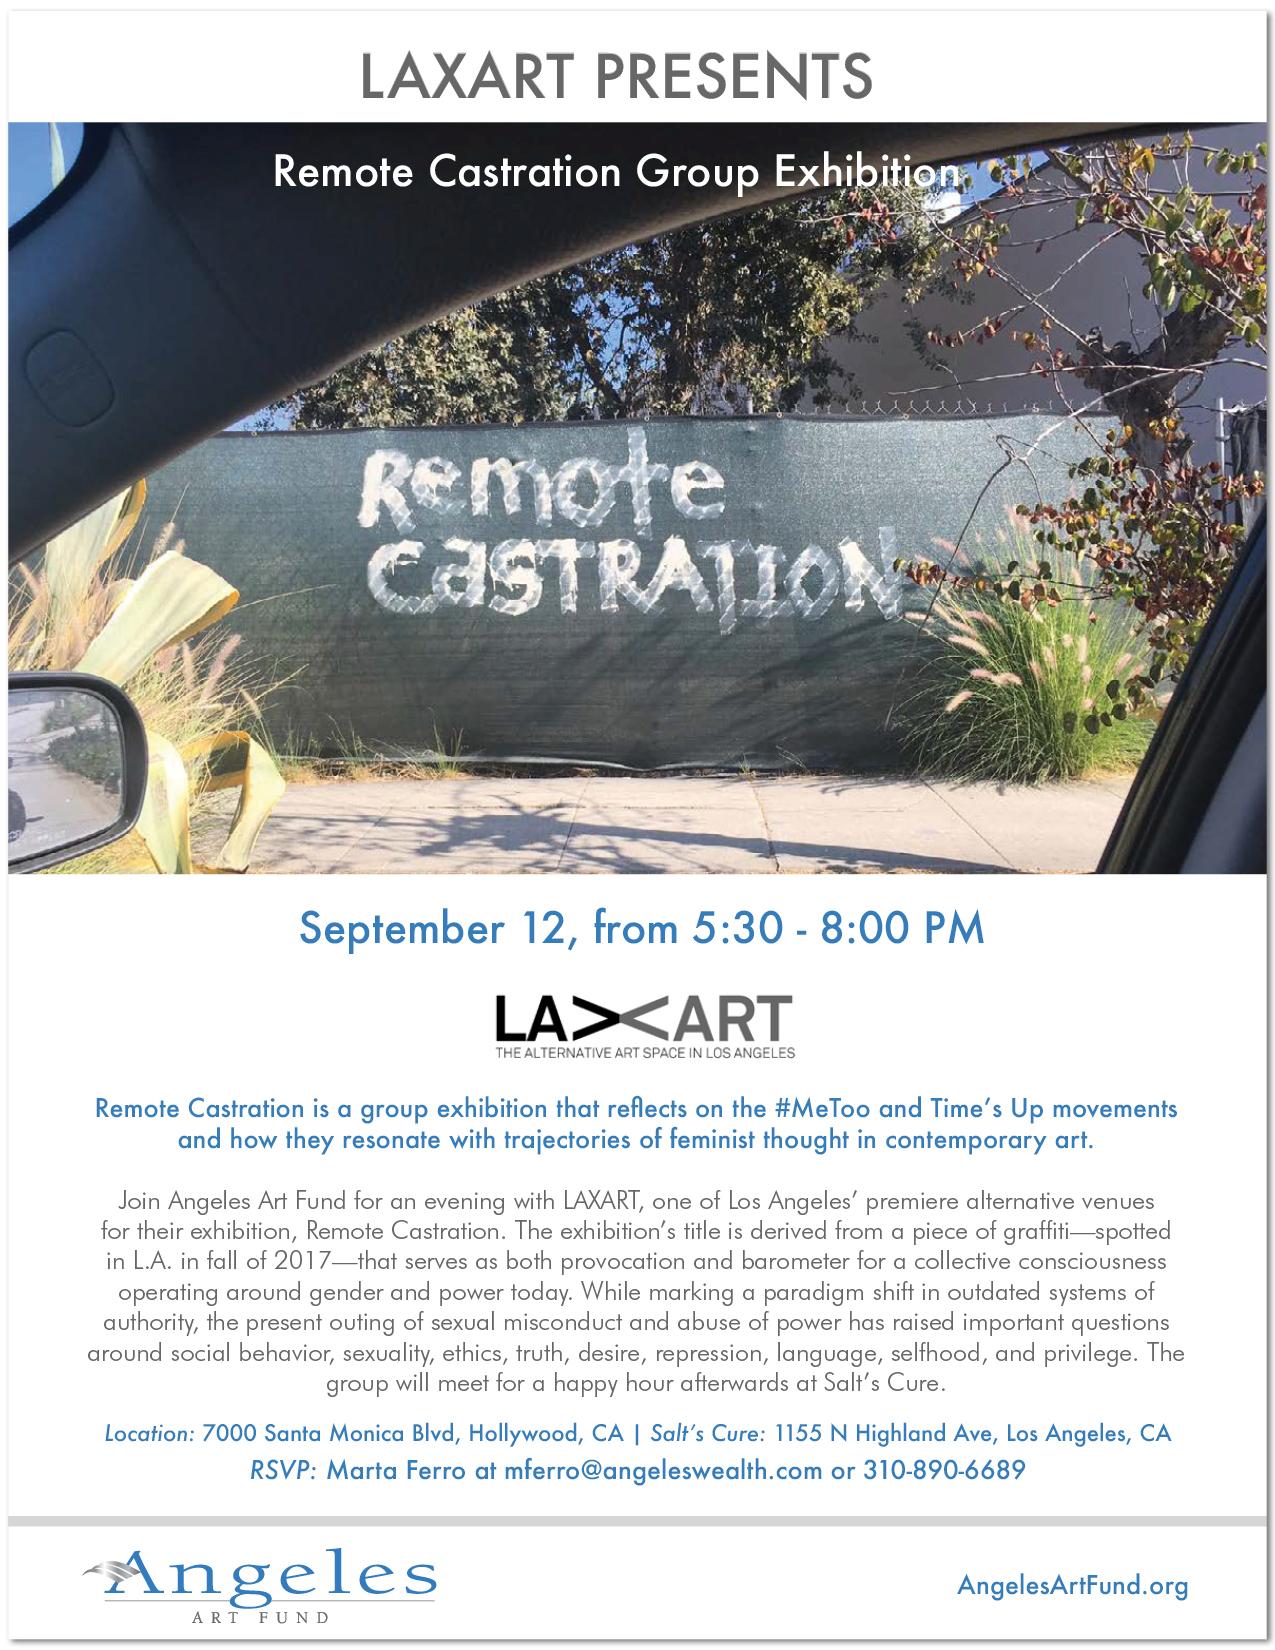 Angeles Art Fund Invites_border7.jpg